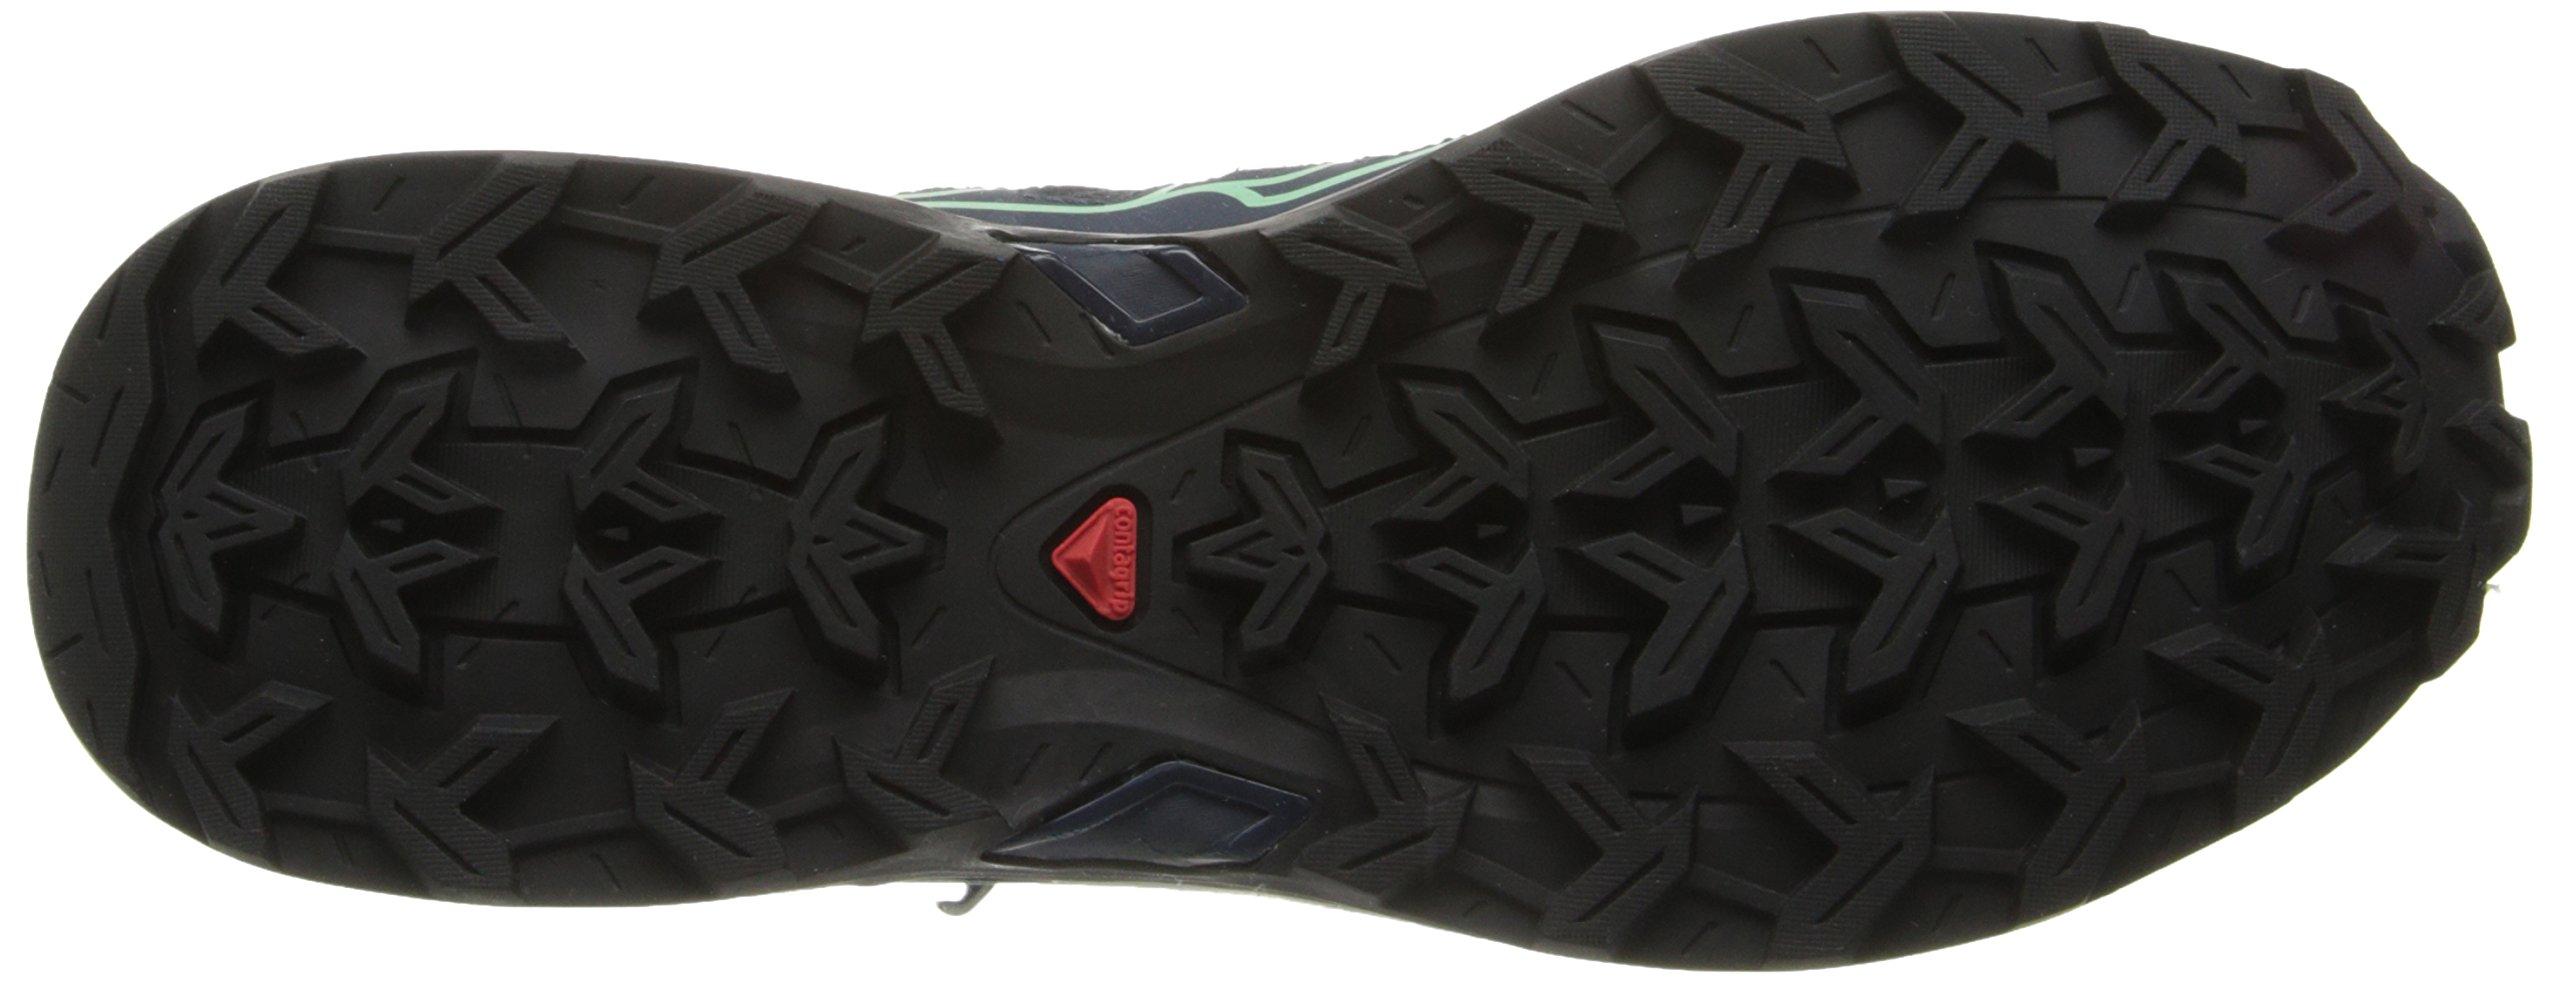 Salomon Women's X Ultra Mid 2 GTX Hiking Shoe, Grey Denim/Deep Blue/Lucite Green, 9 M US by Salomon (Image #3)